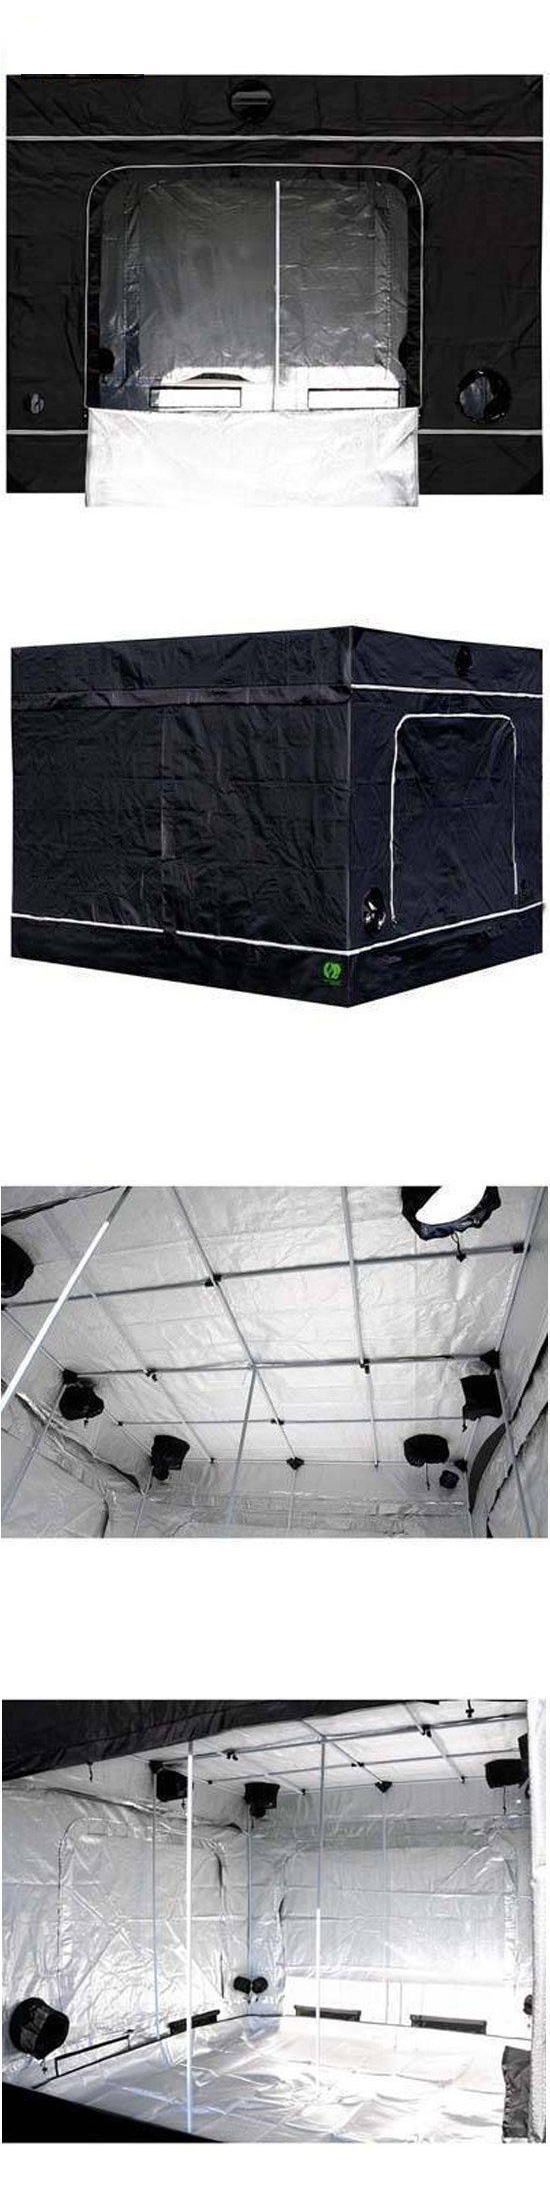 Tents Tarps and Shelves 178993 Growlab Tent Gl 290 Grow Lab Room 9 6 X & Tents Tarps and Shelves 178993: Growlab Tent Gl 290 Grow Lab Room ...